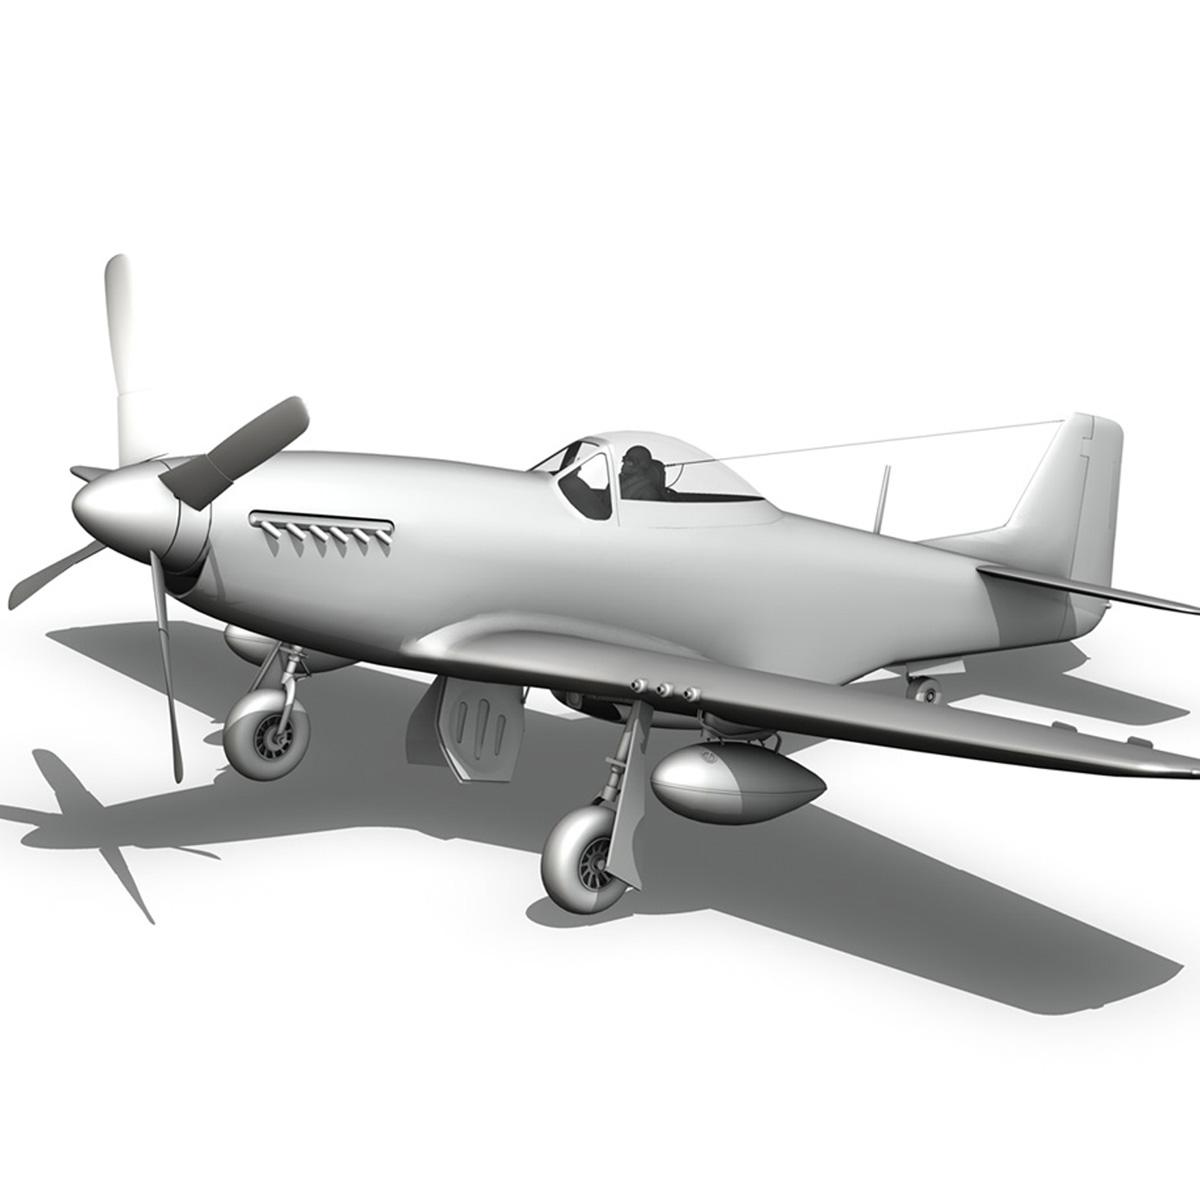 north american p-51d – mustang – detroit miss 3d model 3ds fbx c4d lwo obj 267609